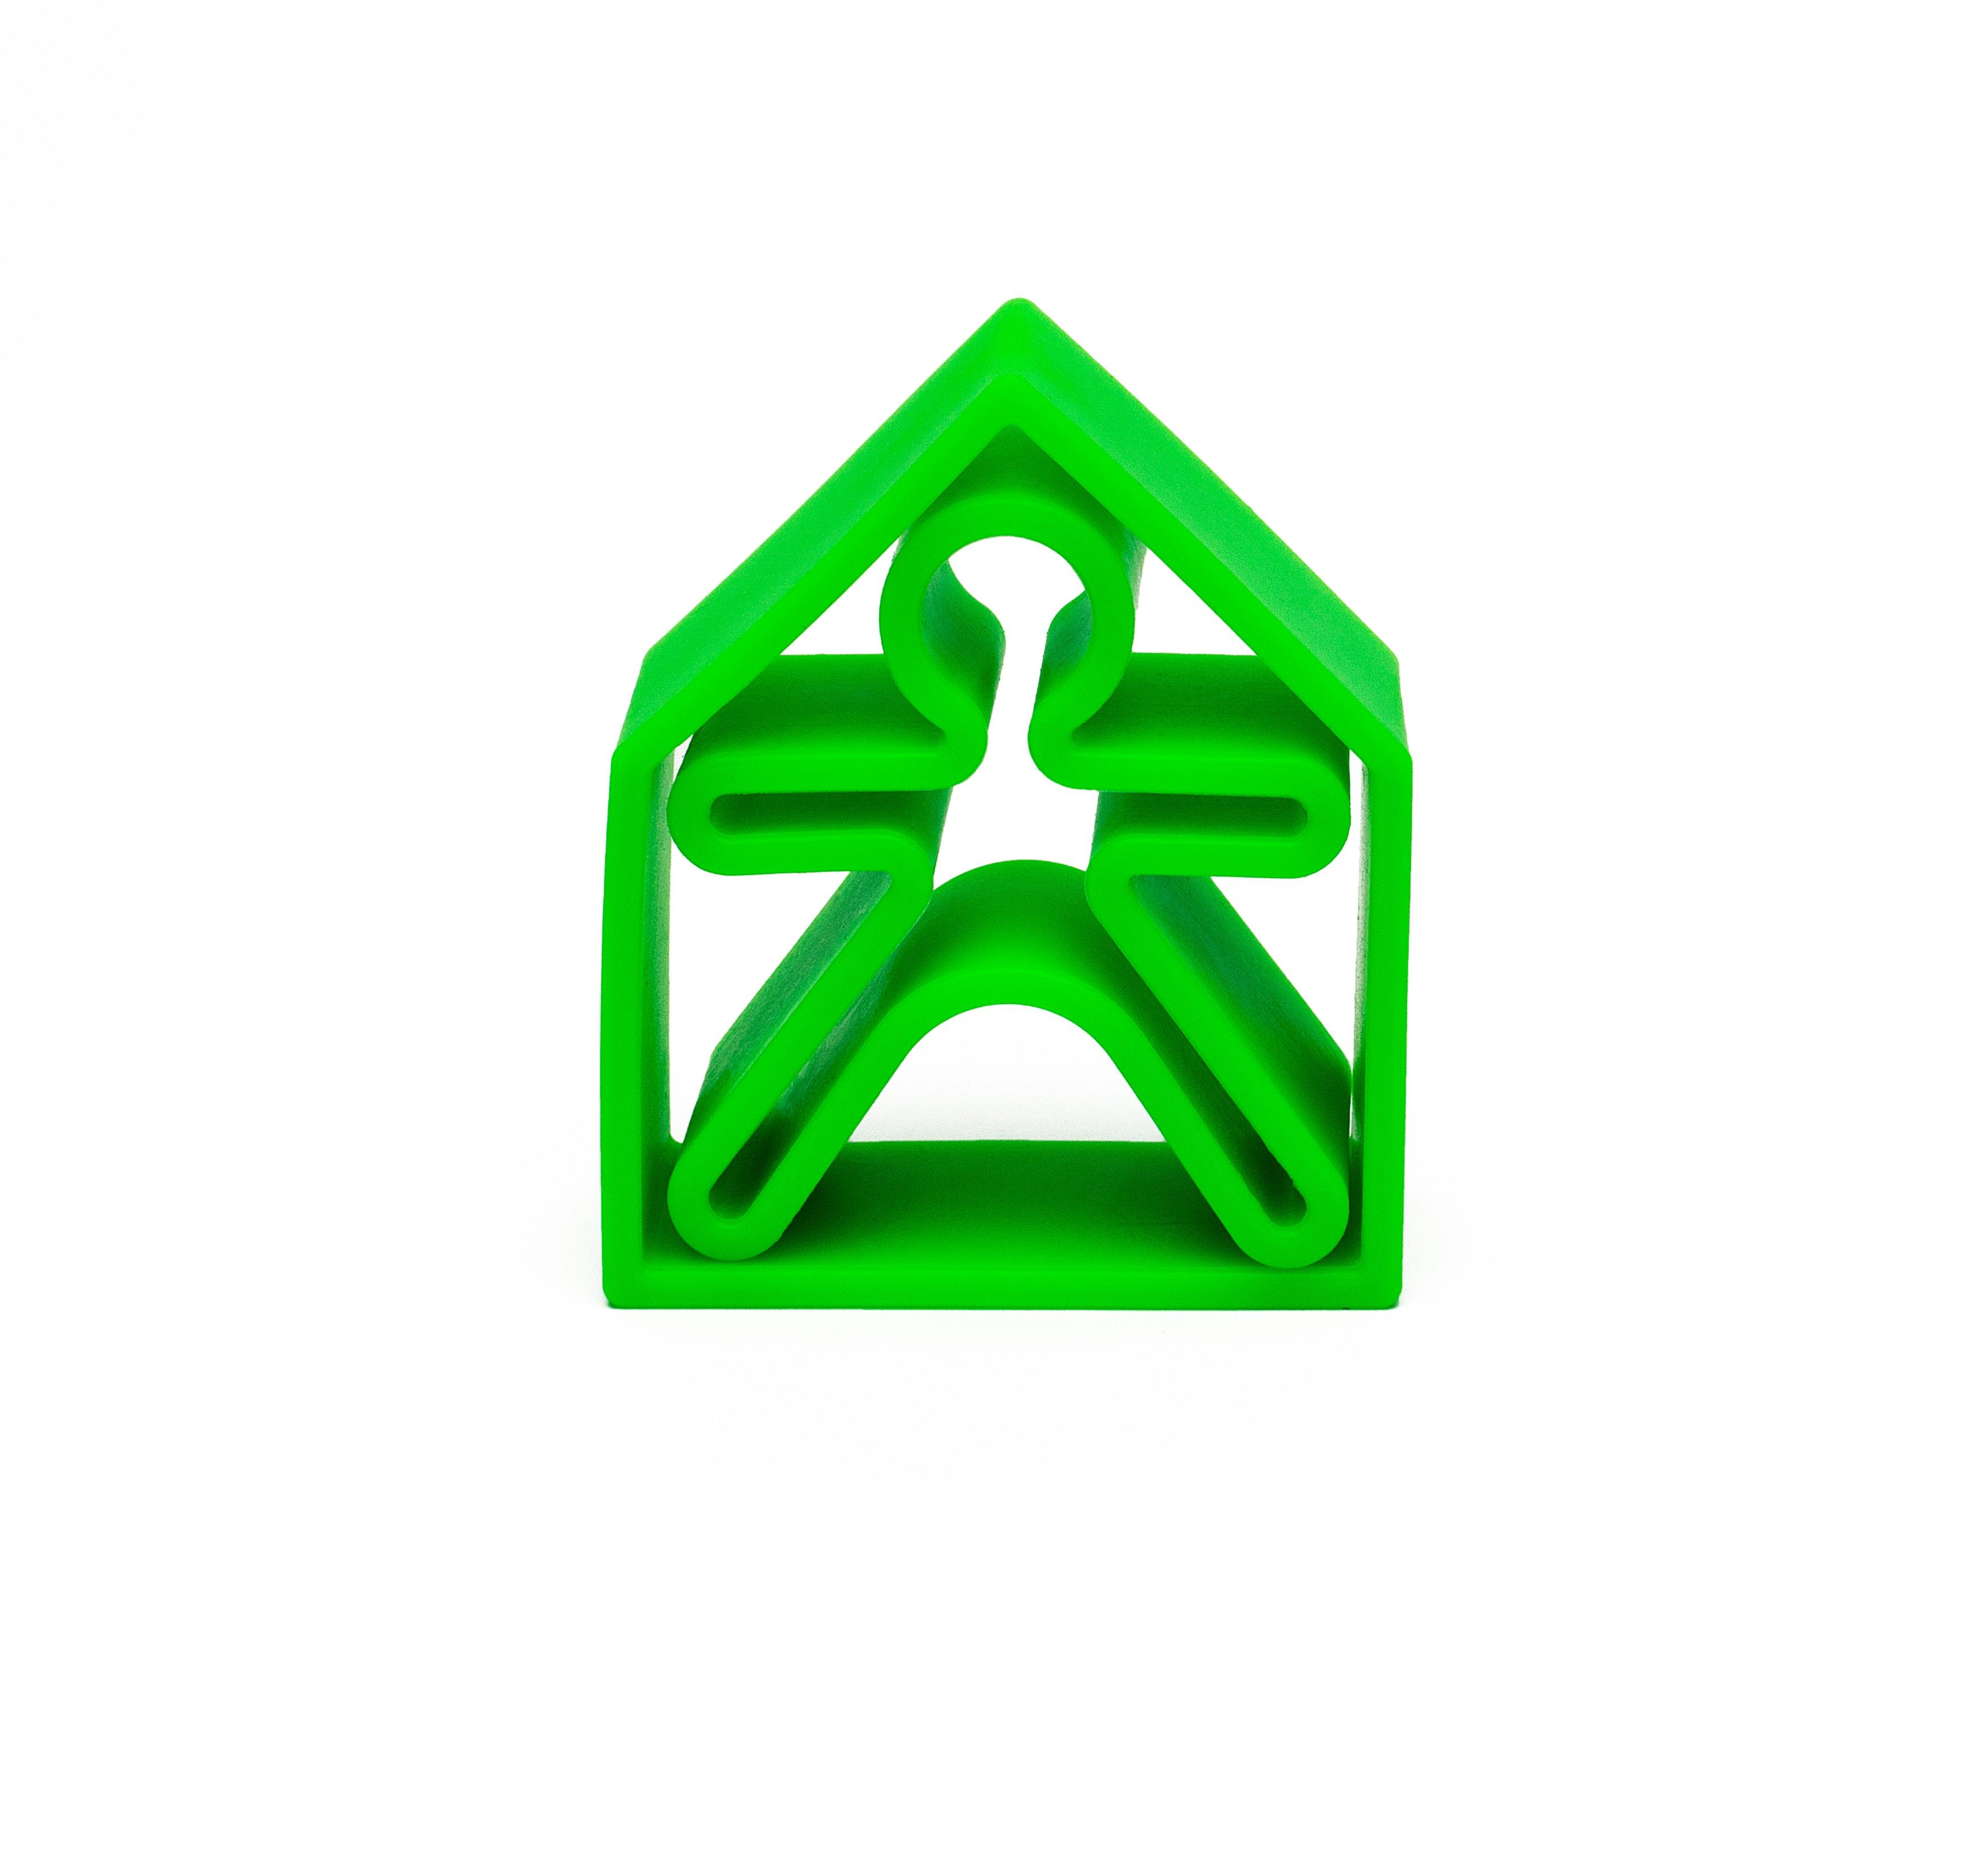 Dena - 1 Kid + 1 House Green Neon